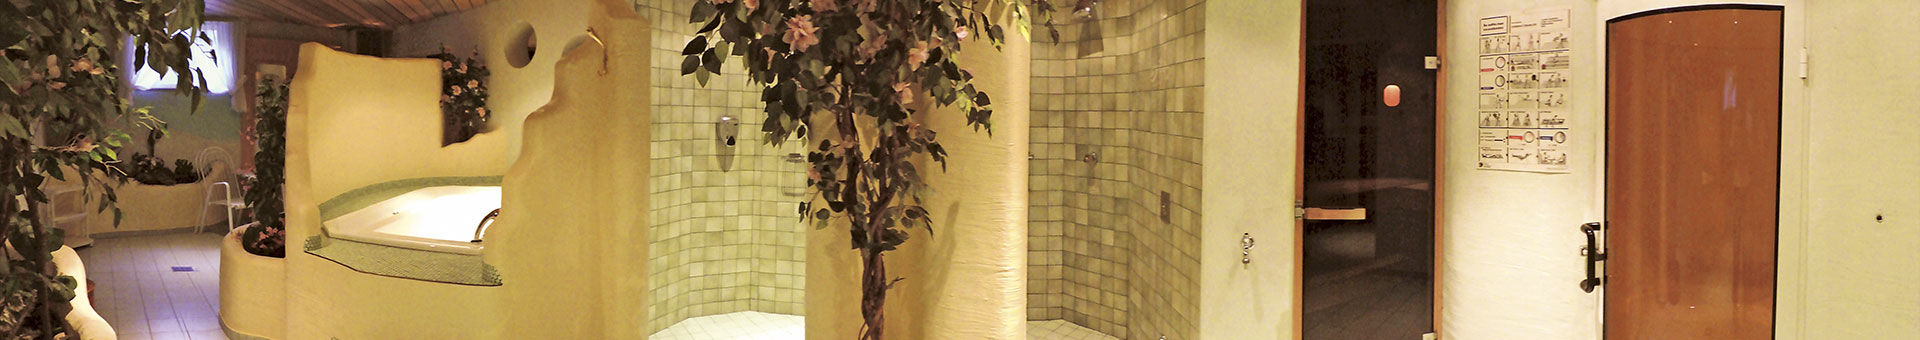 Wellnessbereich im Hotel Garni Santa Barbara